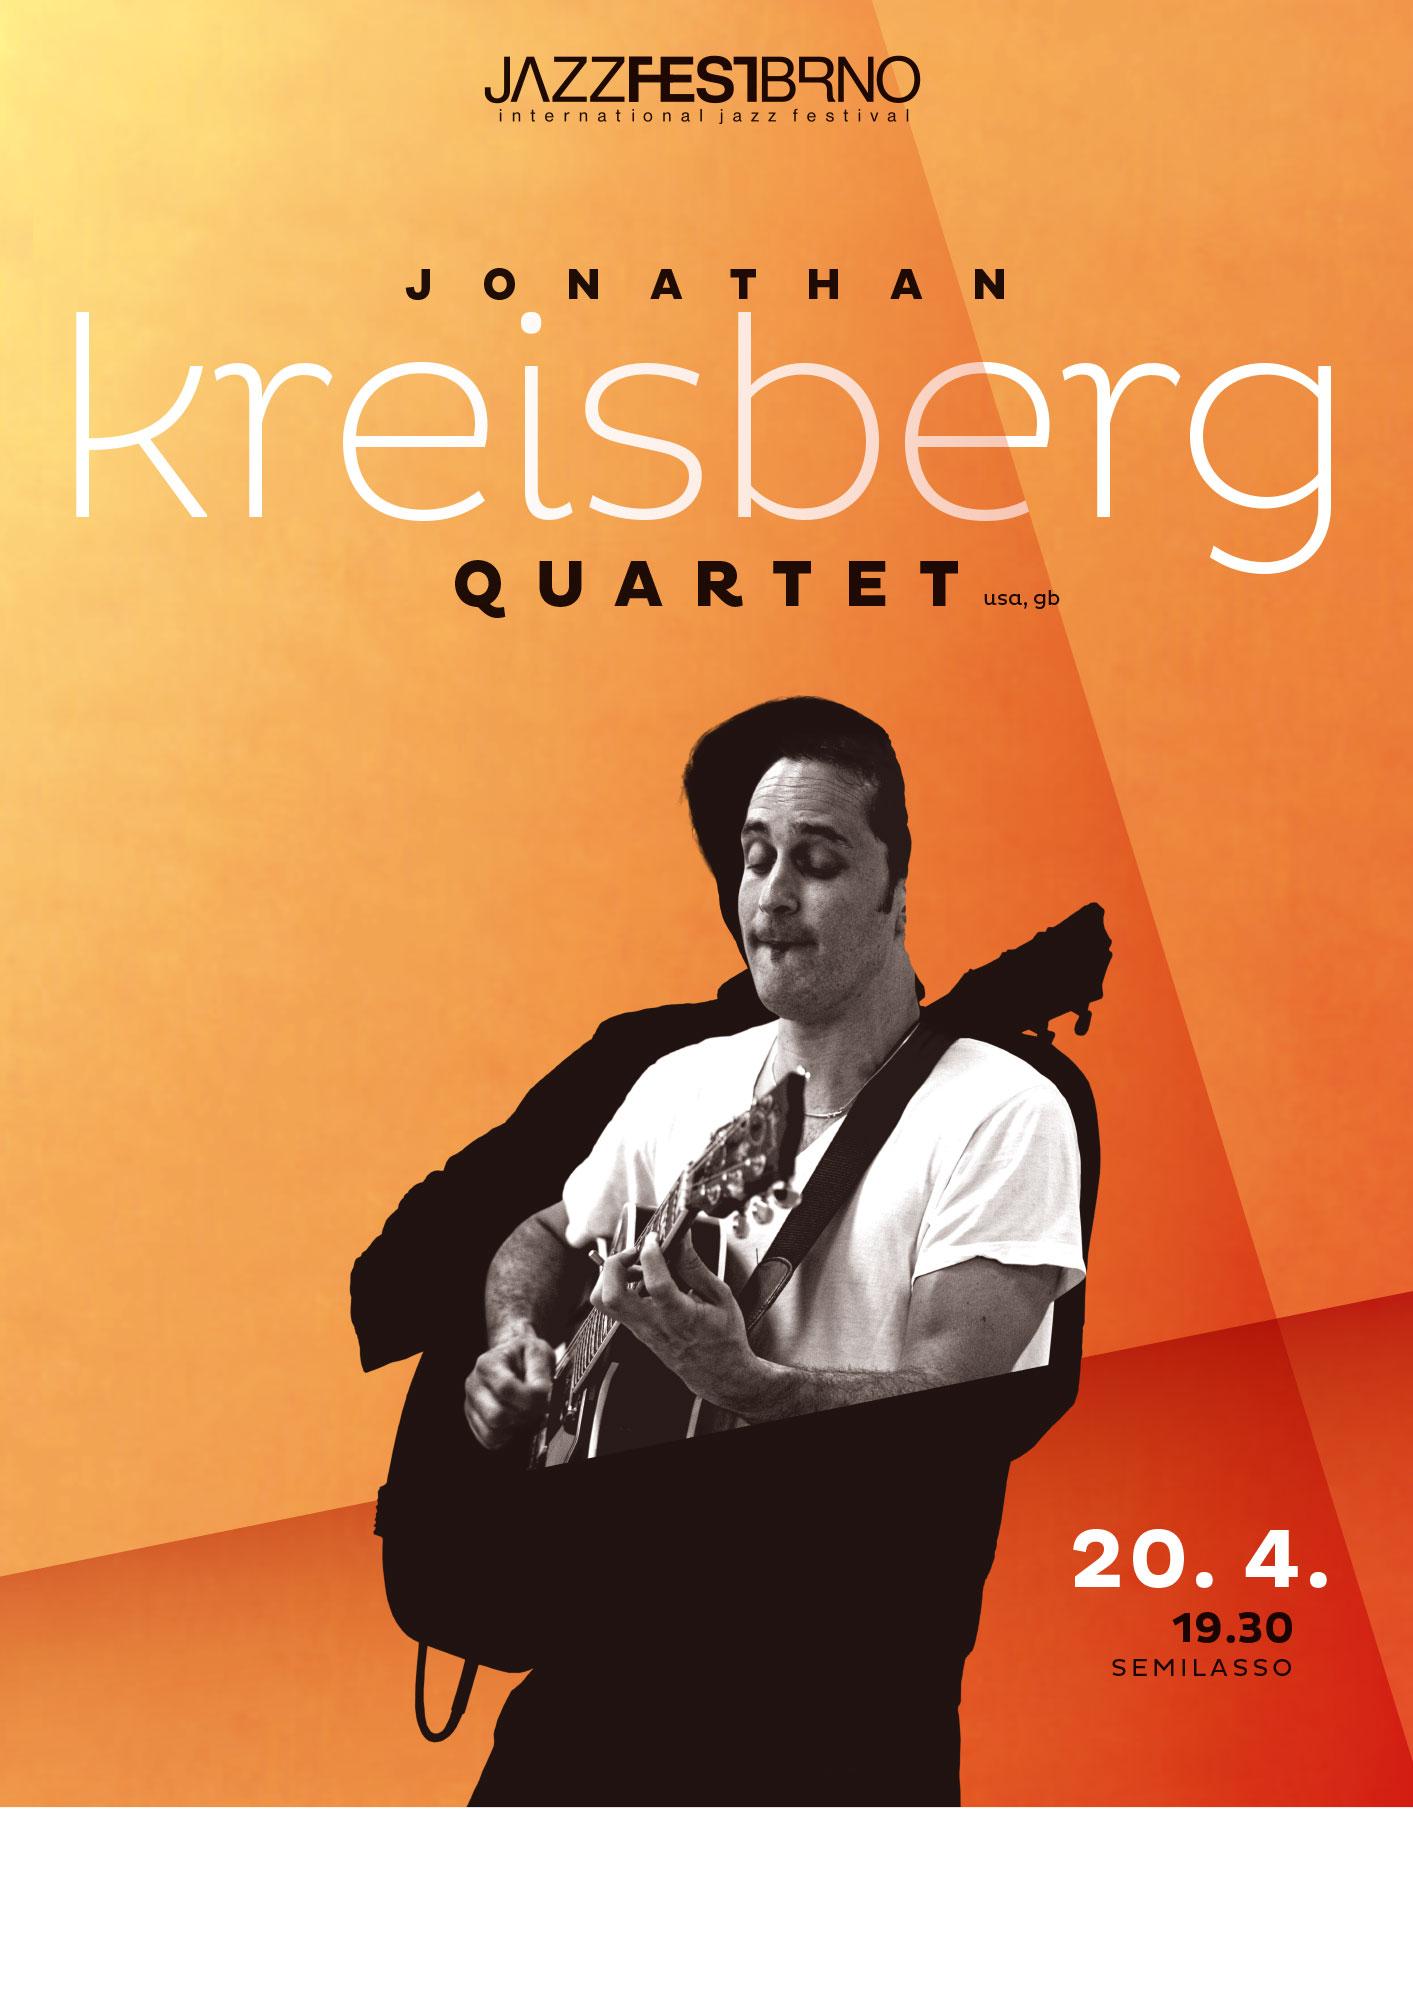 JazzFestBrno 2012 – Jonathan Kreisberg